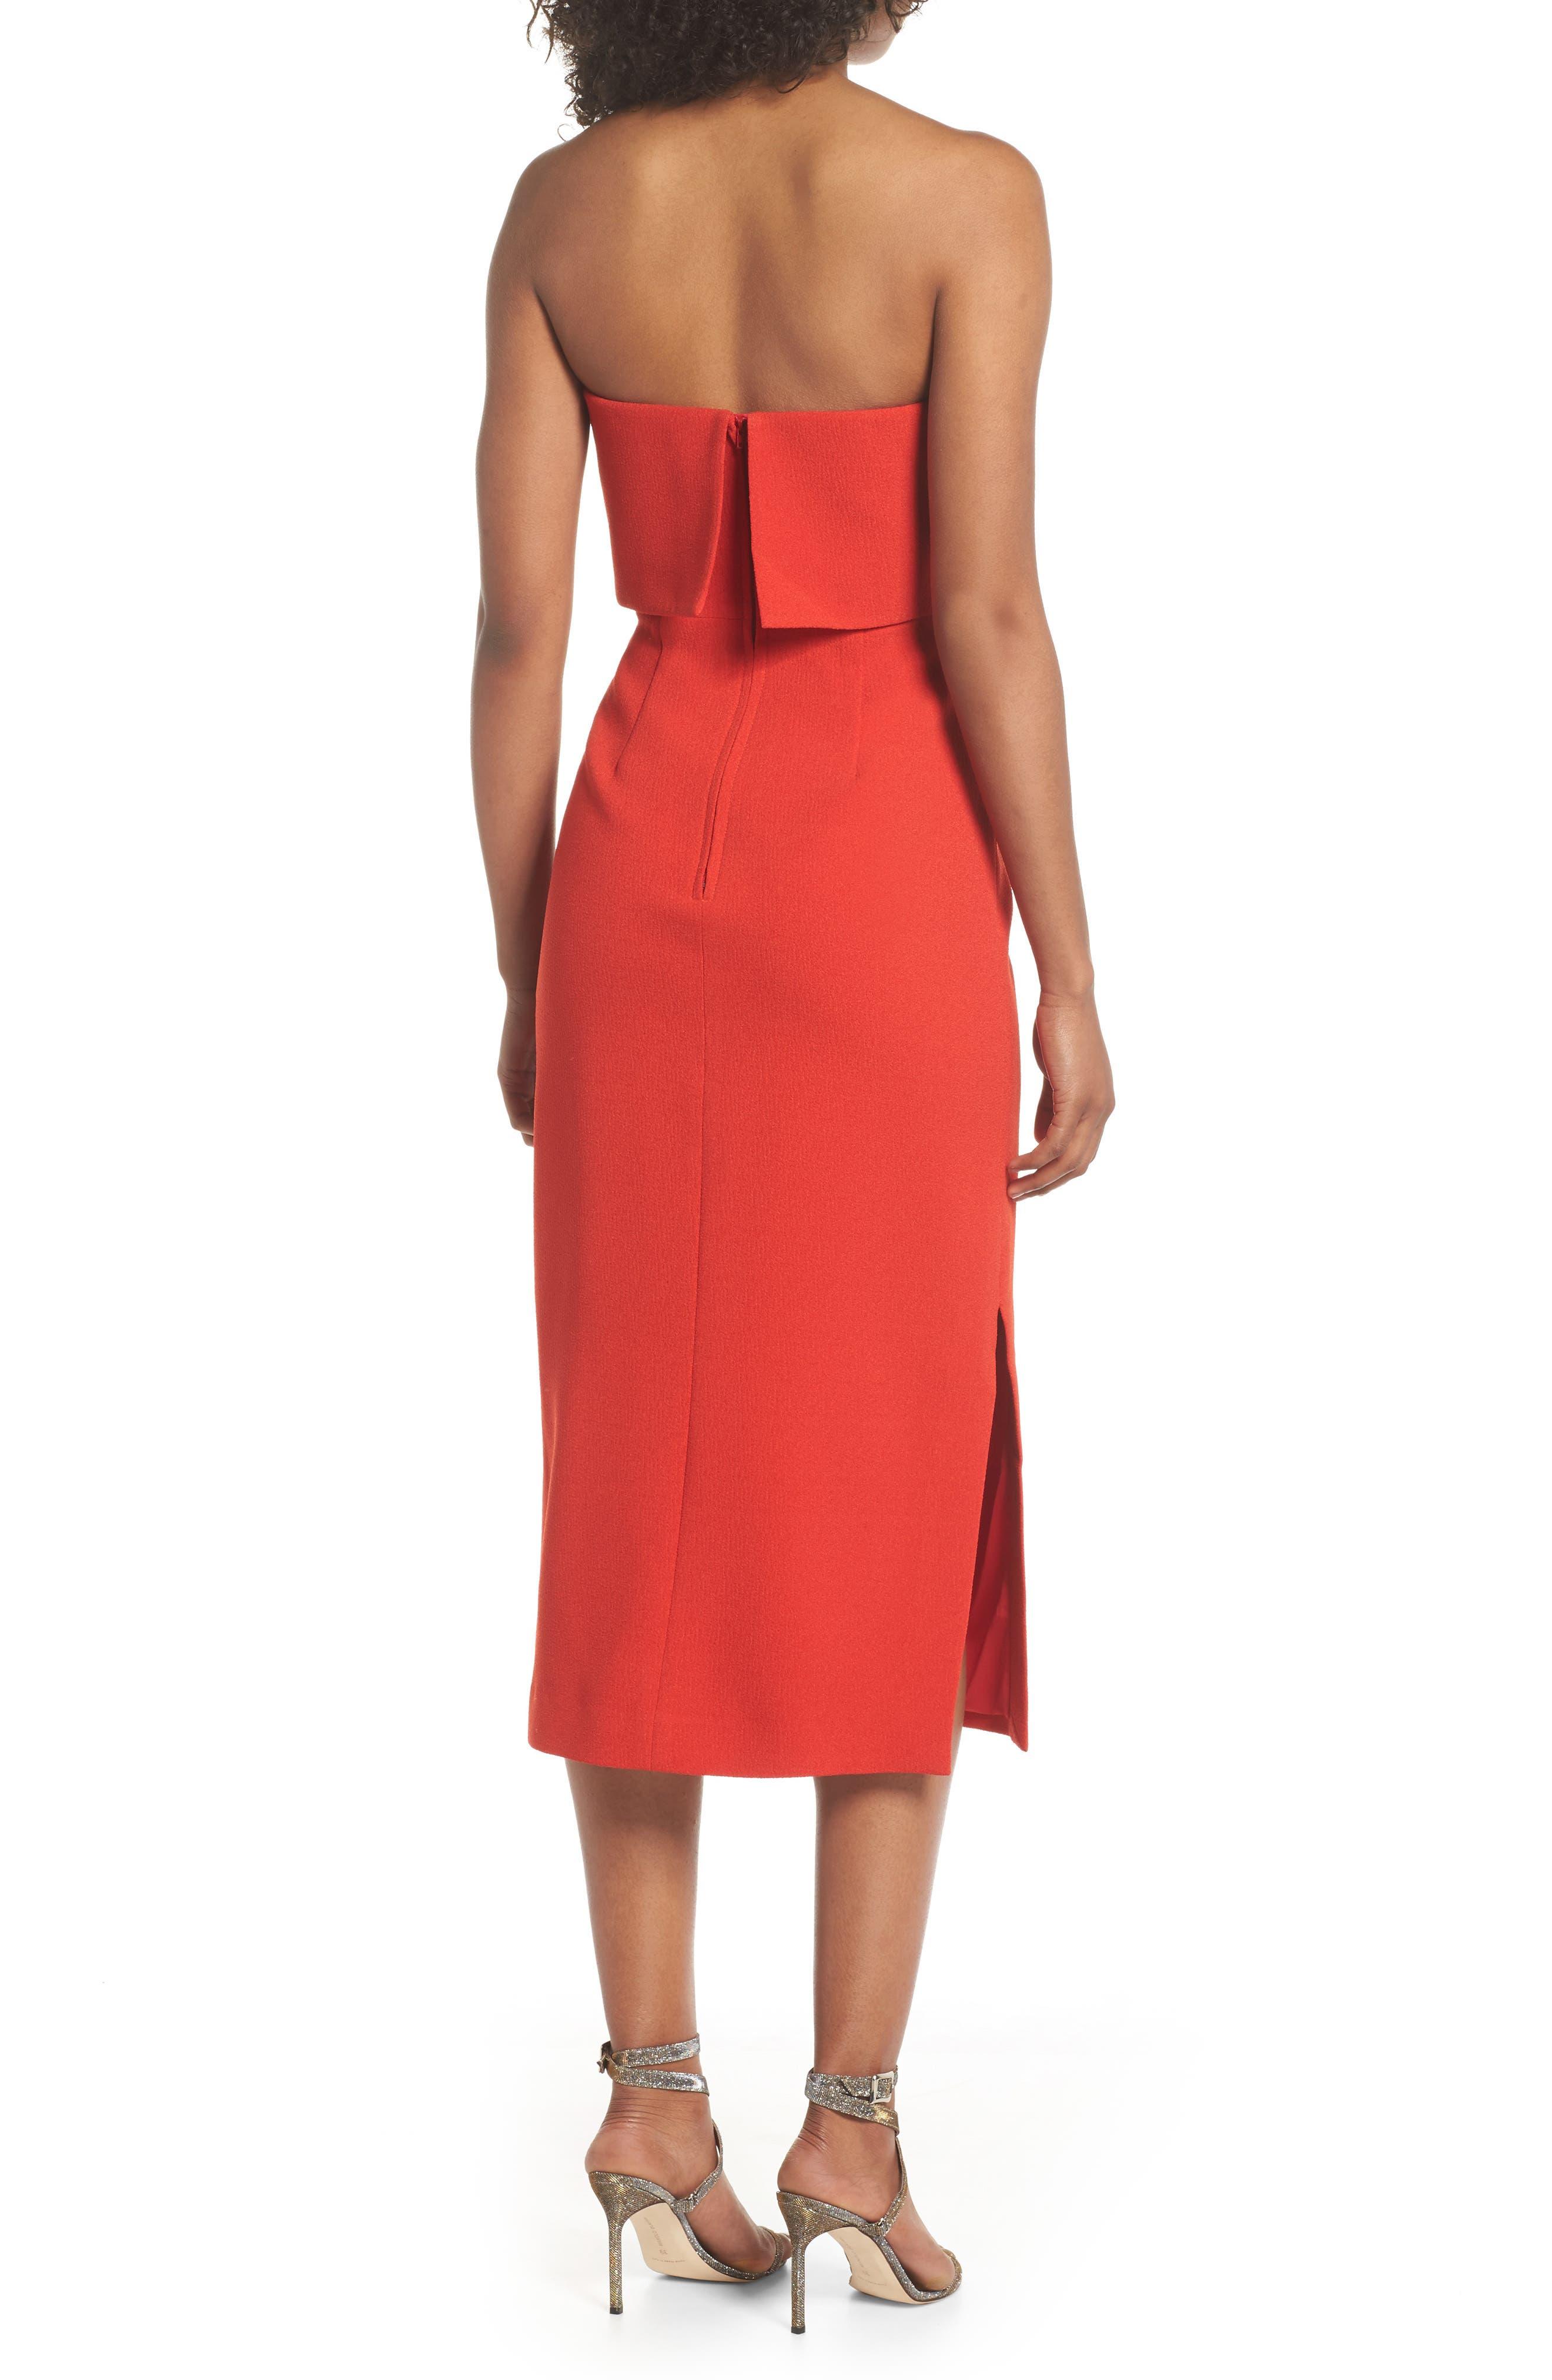 Entice Strapless Midi Dress,                             Alternate thumbnail 2, color,                             Red